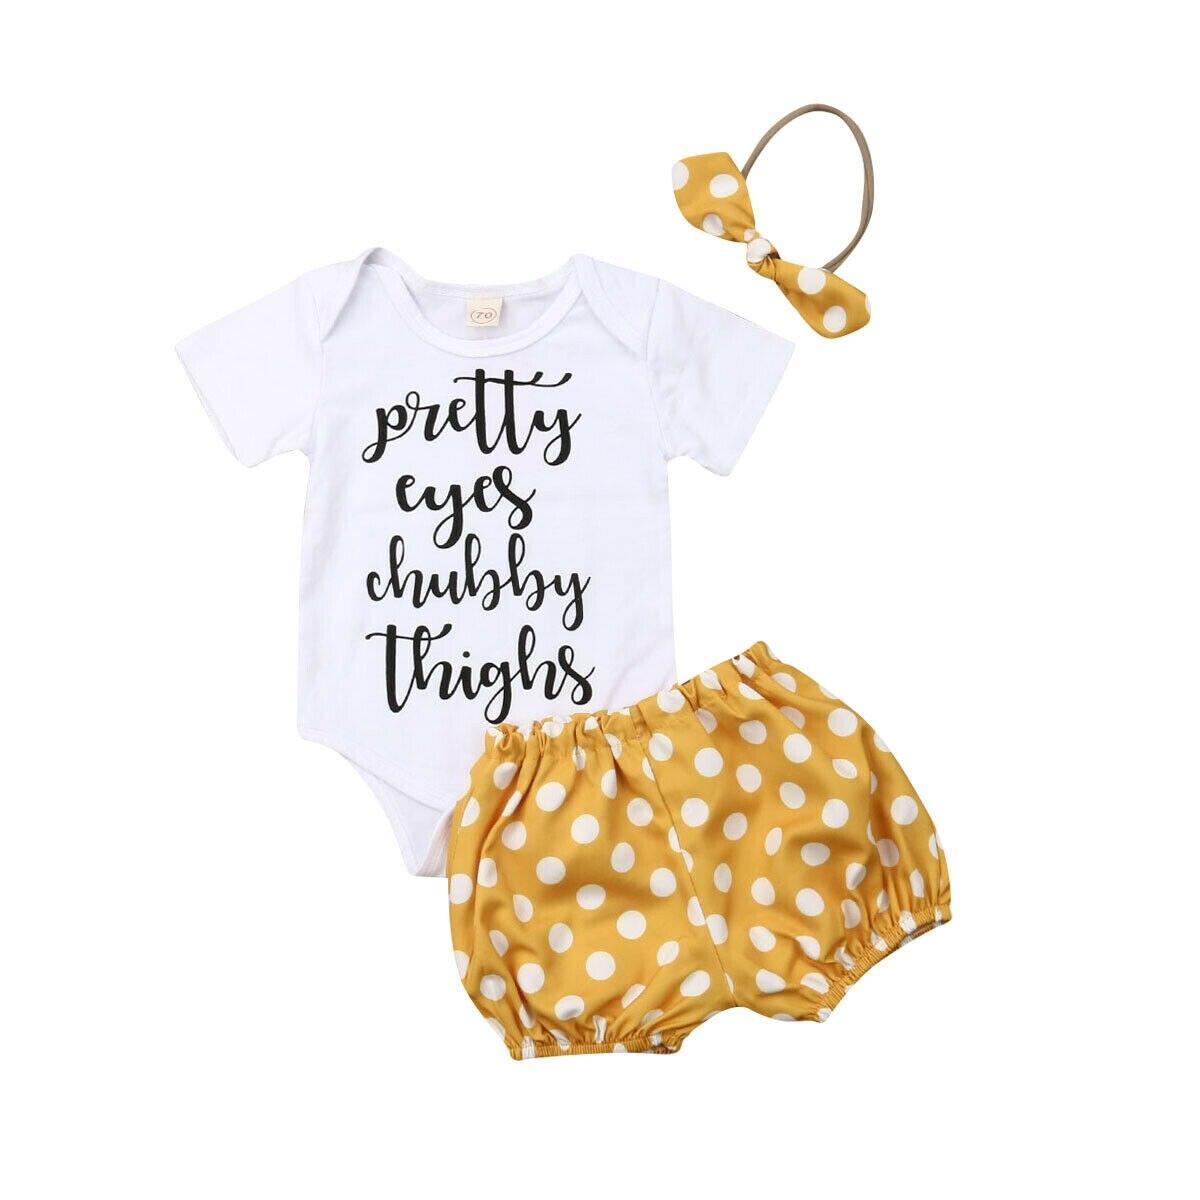 0-24 M Bonito Bebê Recém-nascido Menina Bodysuit de Algodão De Manga Curta Tops Polka Dot Shorts Pant Inferior Cabeça 3 PCS Conjunto de Roupas de Bebê